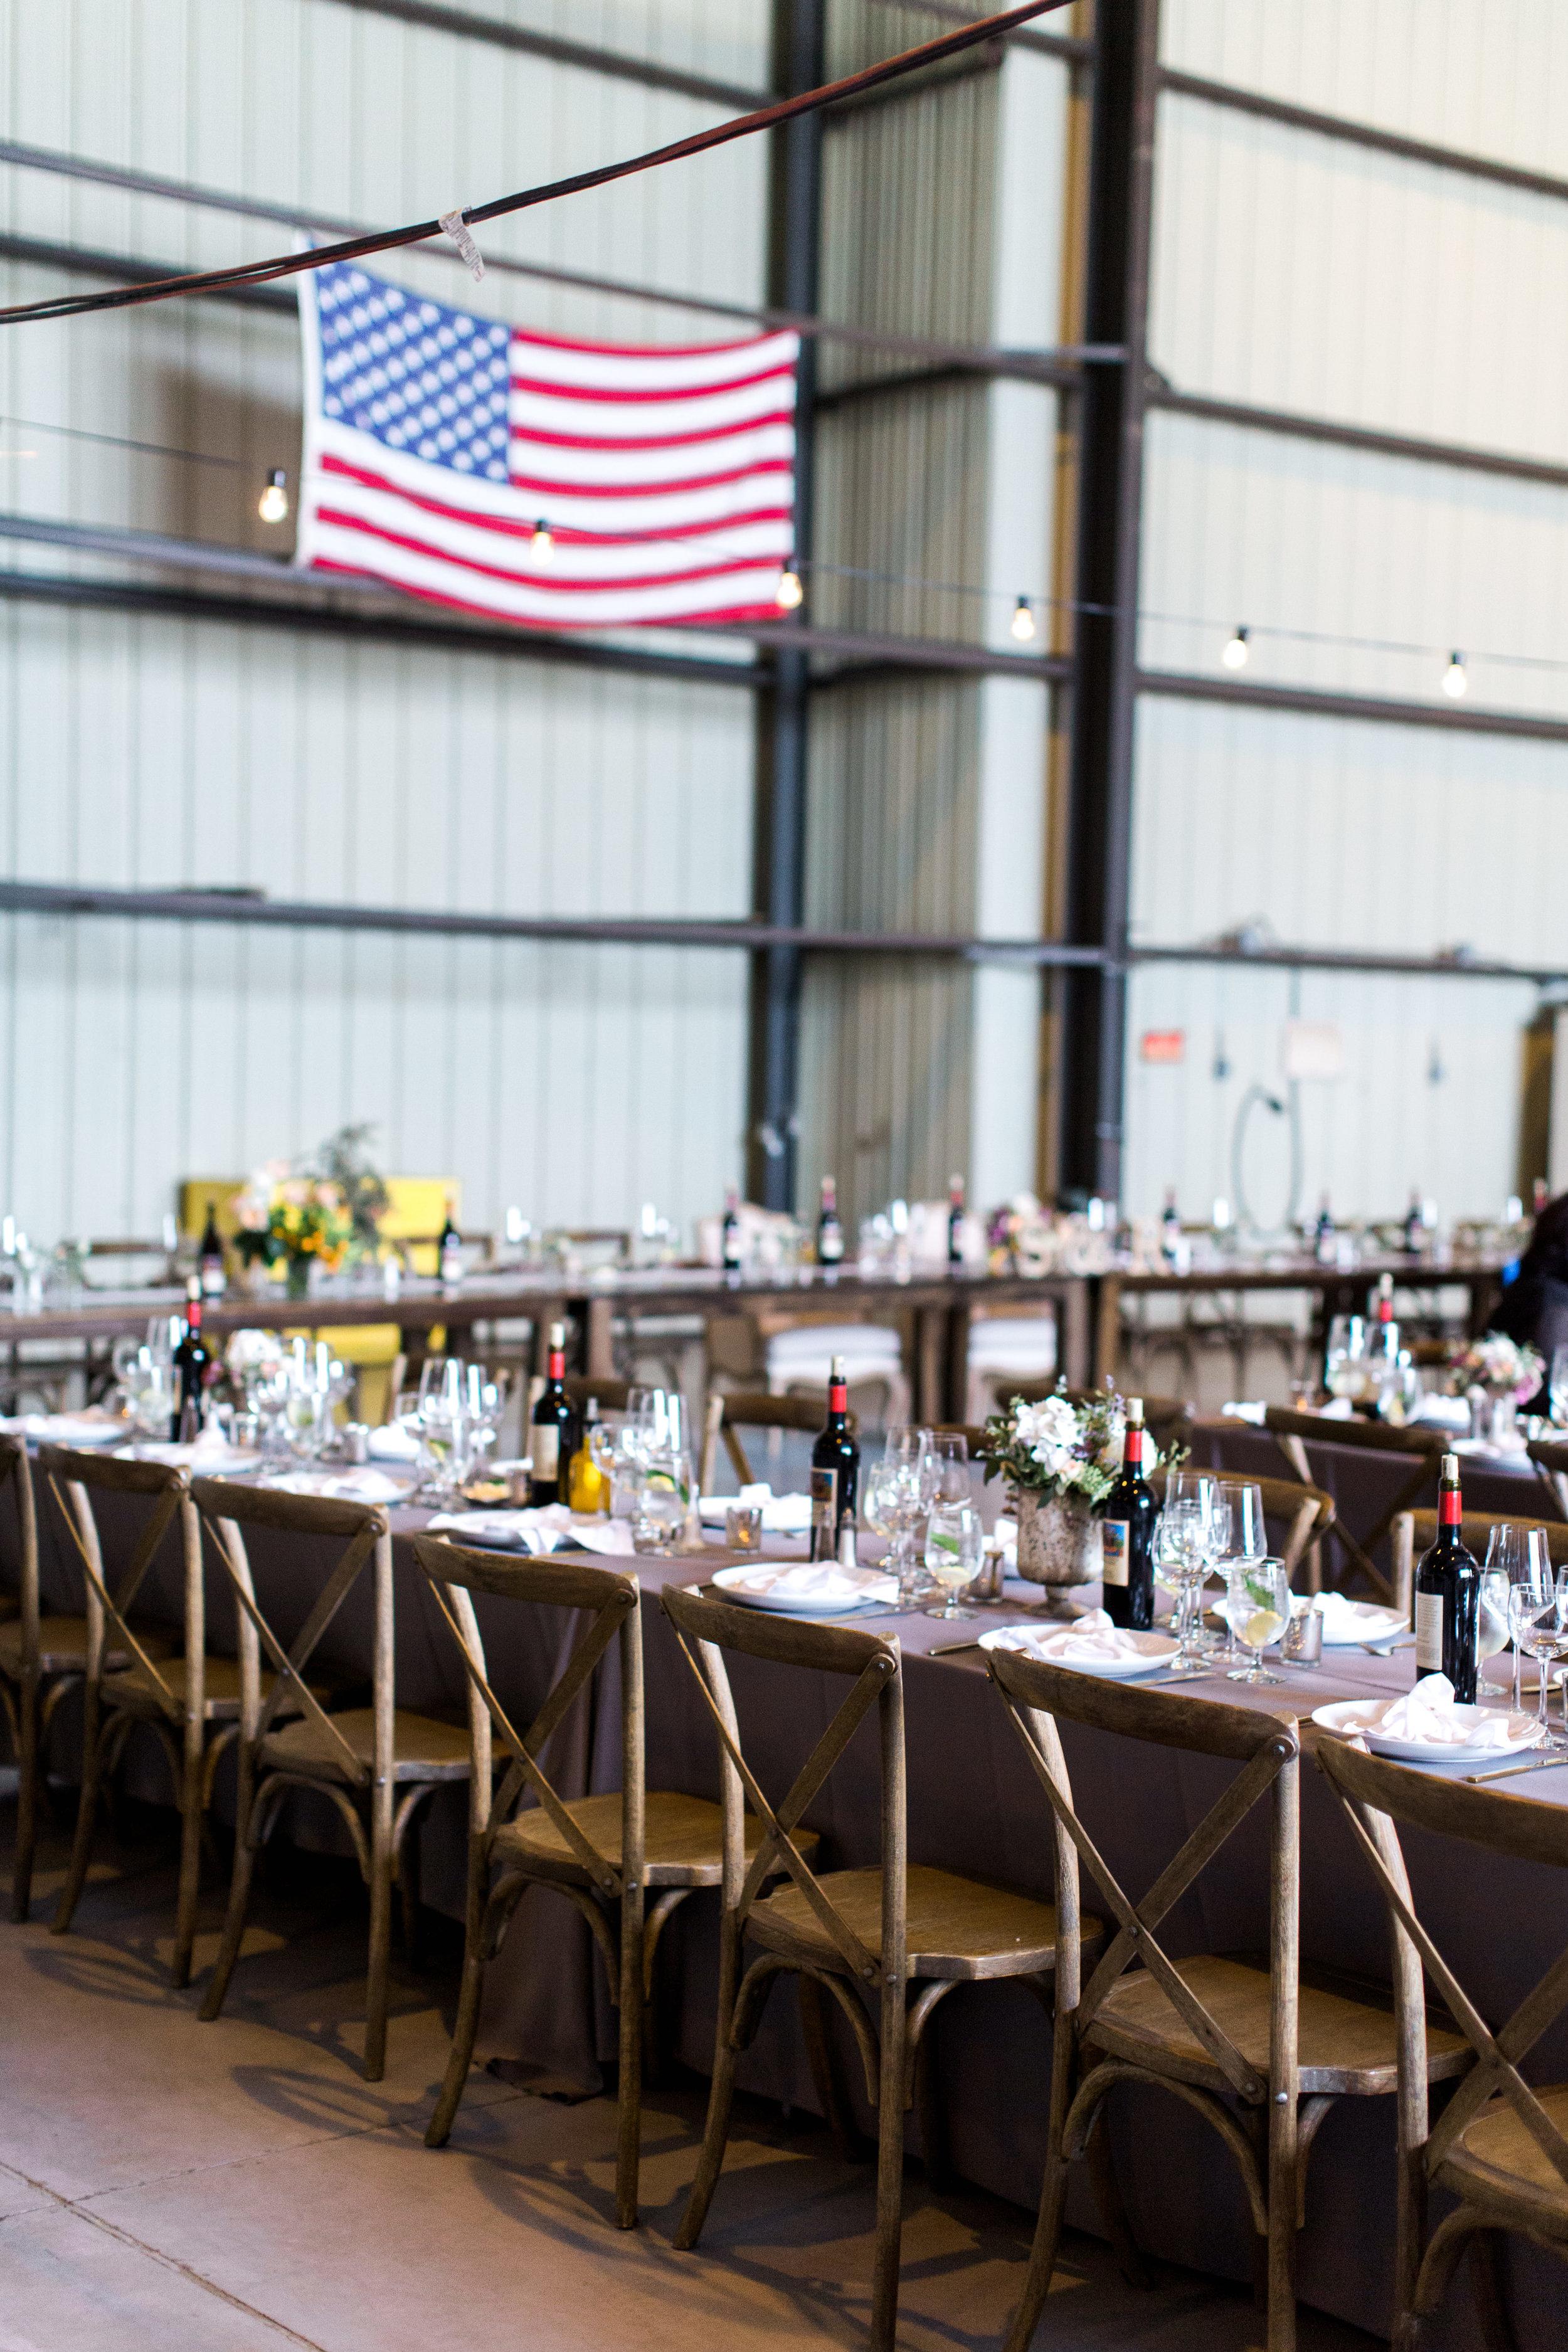 airport-hanger-wedding-at-attitude-aviation-in-livermore-29.jpg